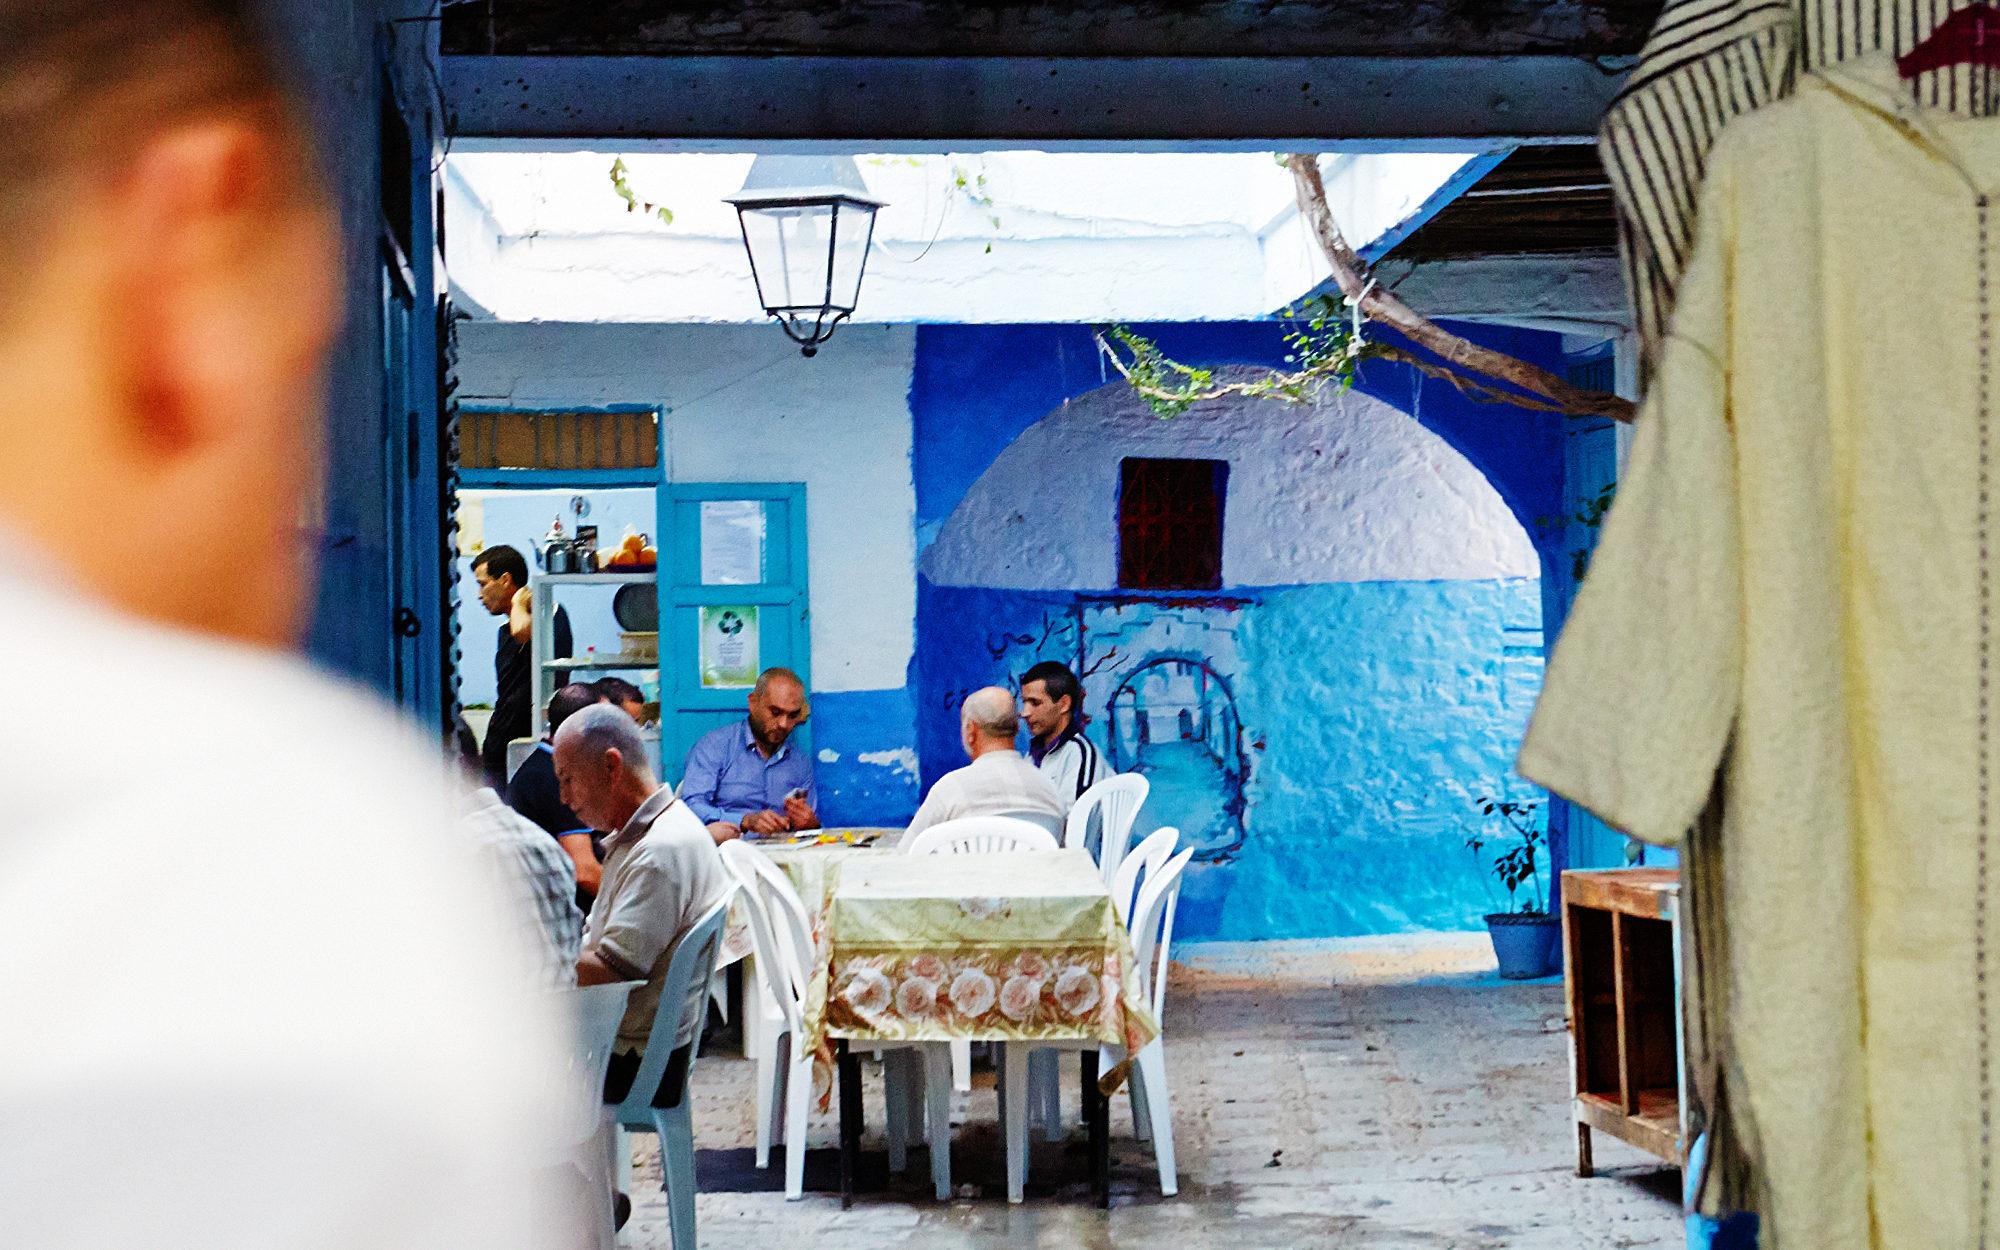 Anna_McKerrow_Morocco_09.jpg